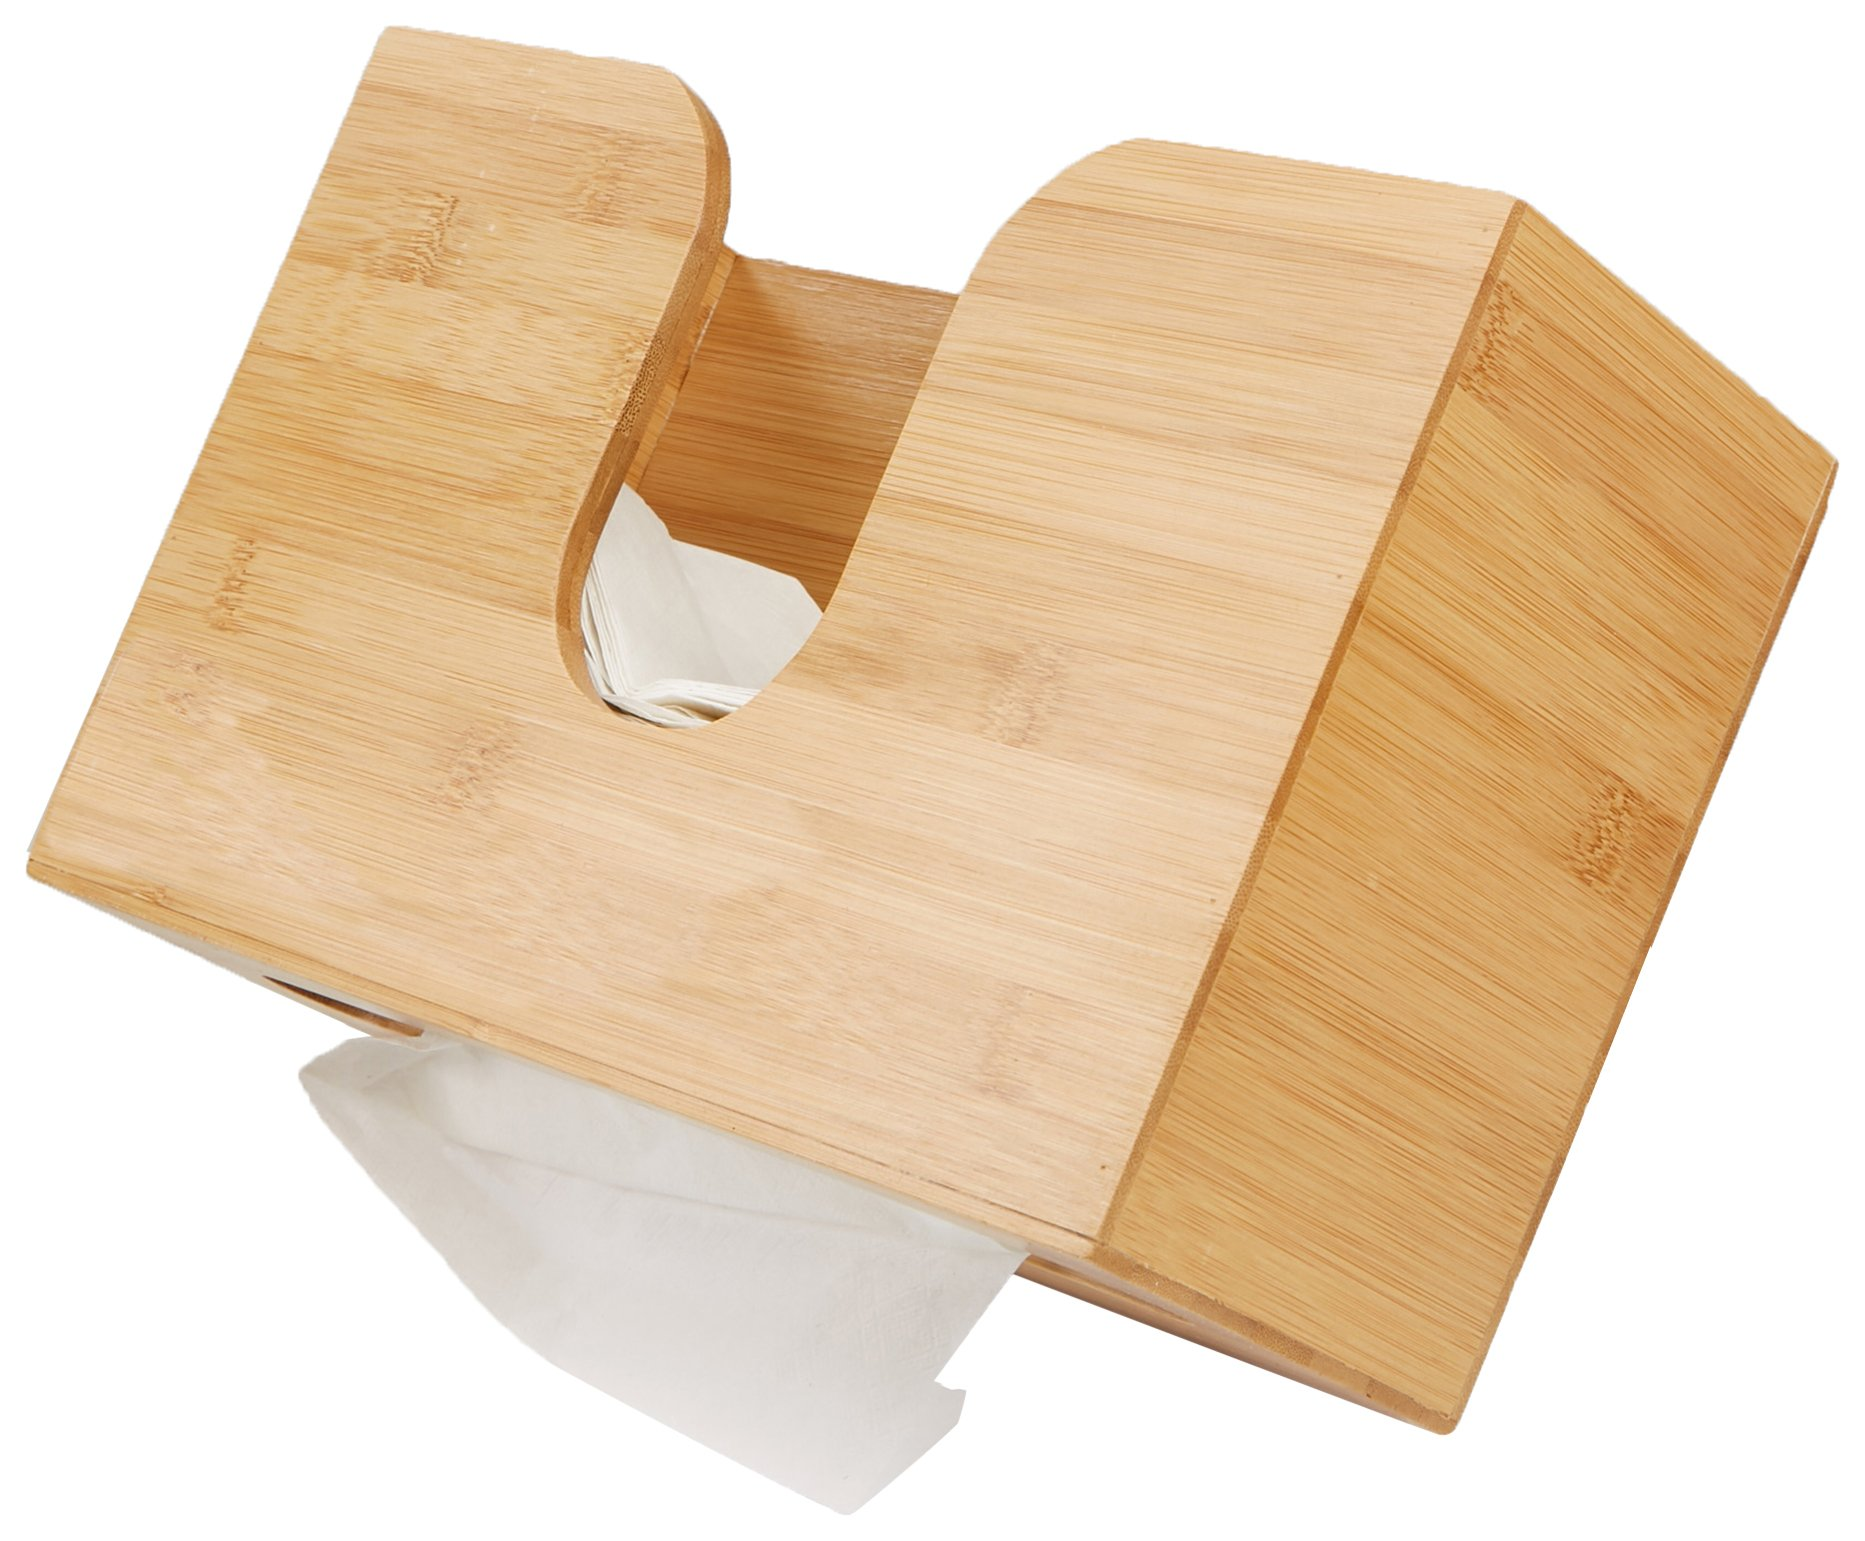 Mind Reader Bamboo Wall Mount Interfold Napkin Dispenser Organizer, Brown by Mind Reader (Image #1)